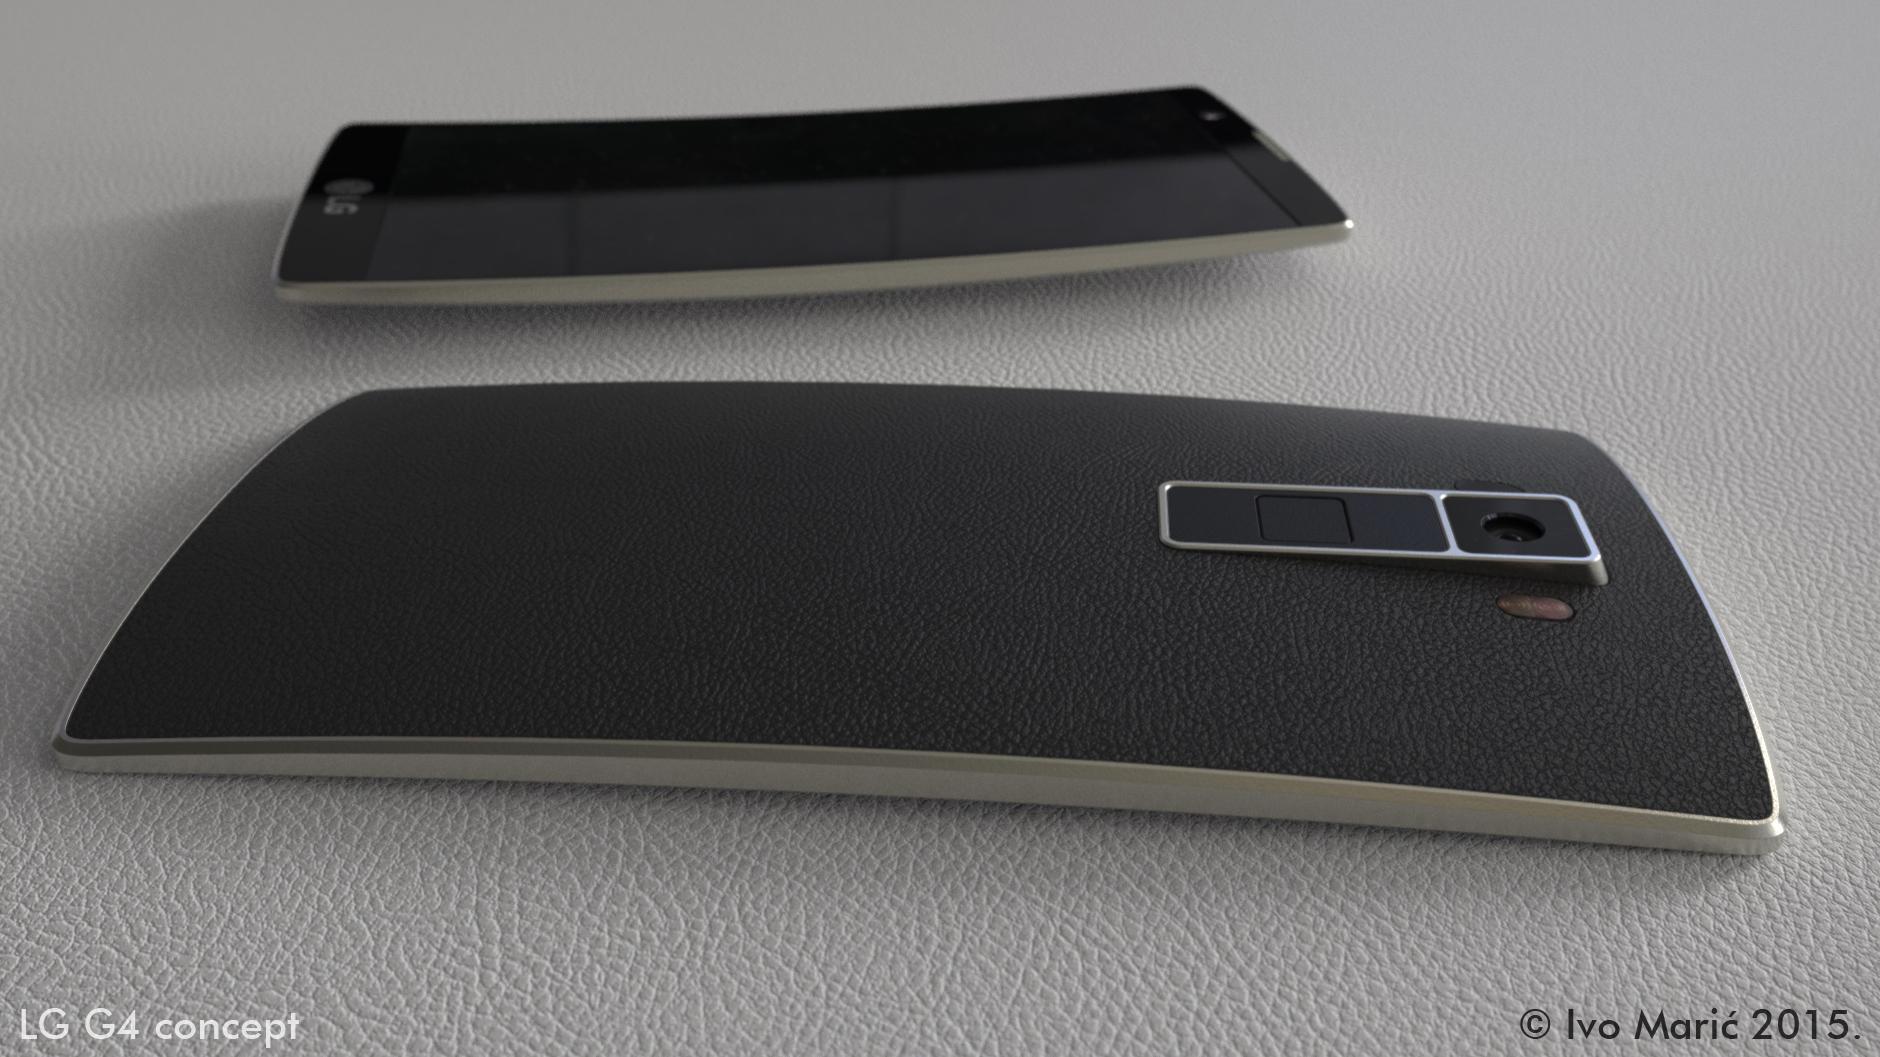 LG G4'�n en iyi 5 konsept �al��mas�